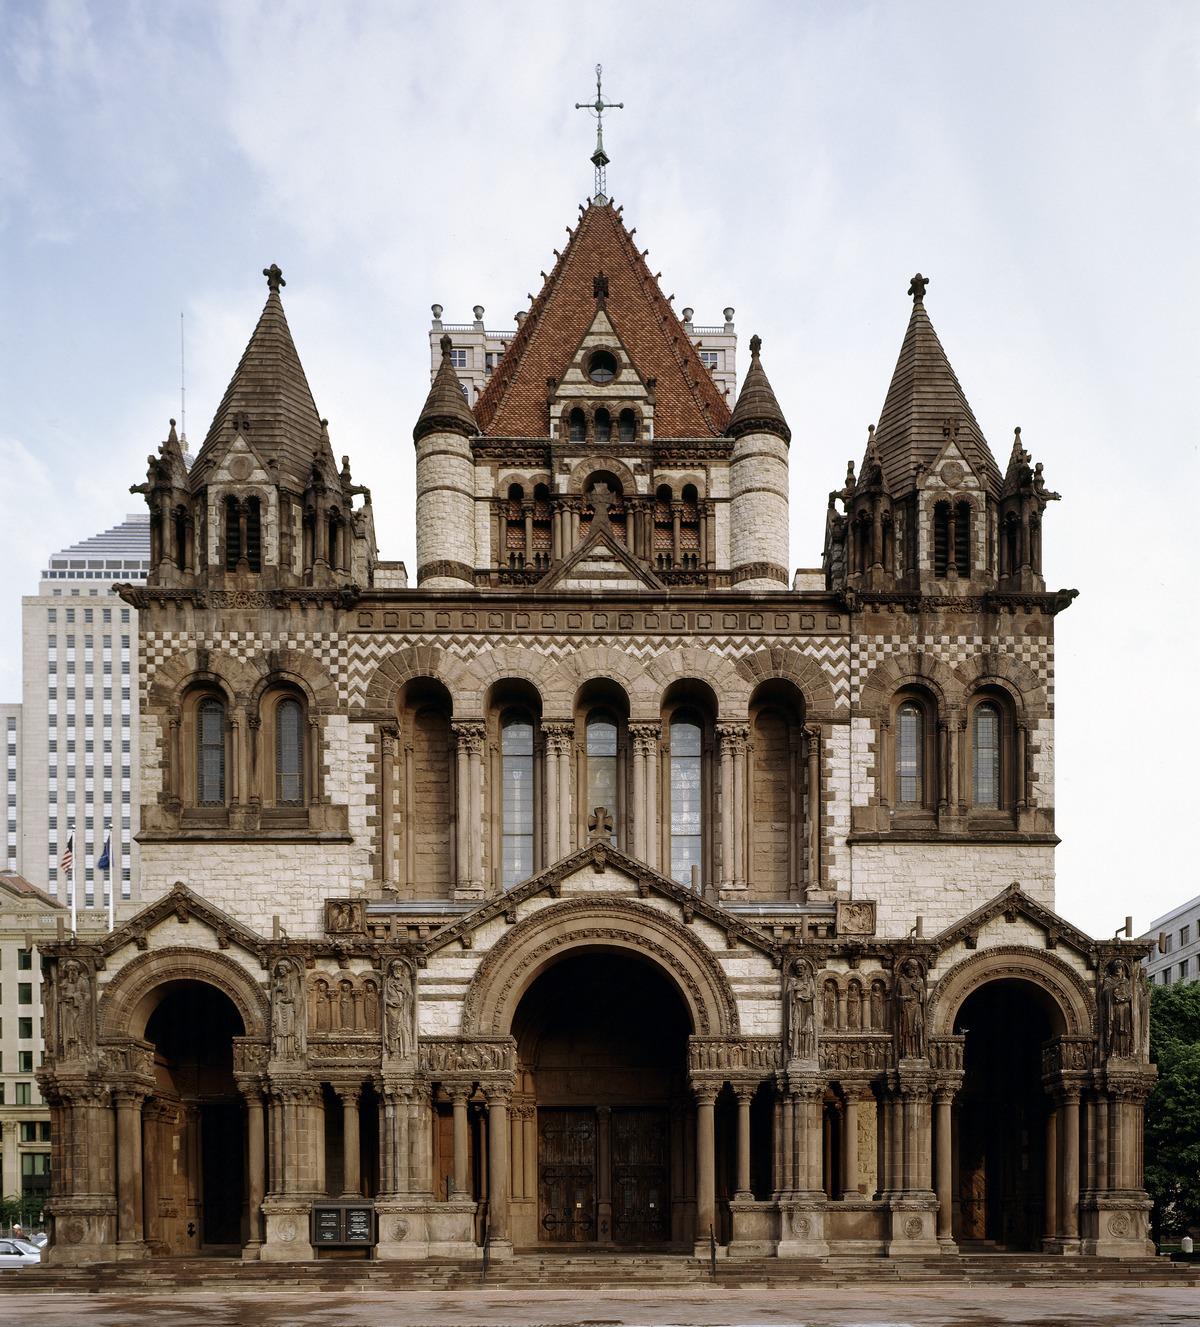 Boston's Trinity Church